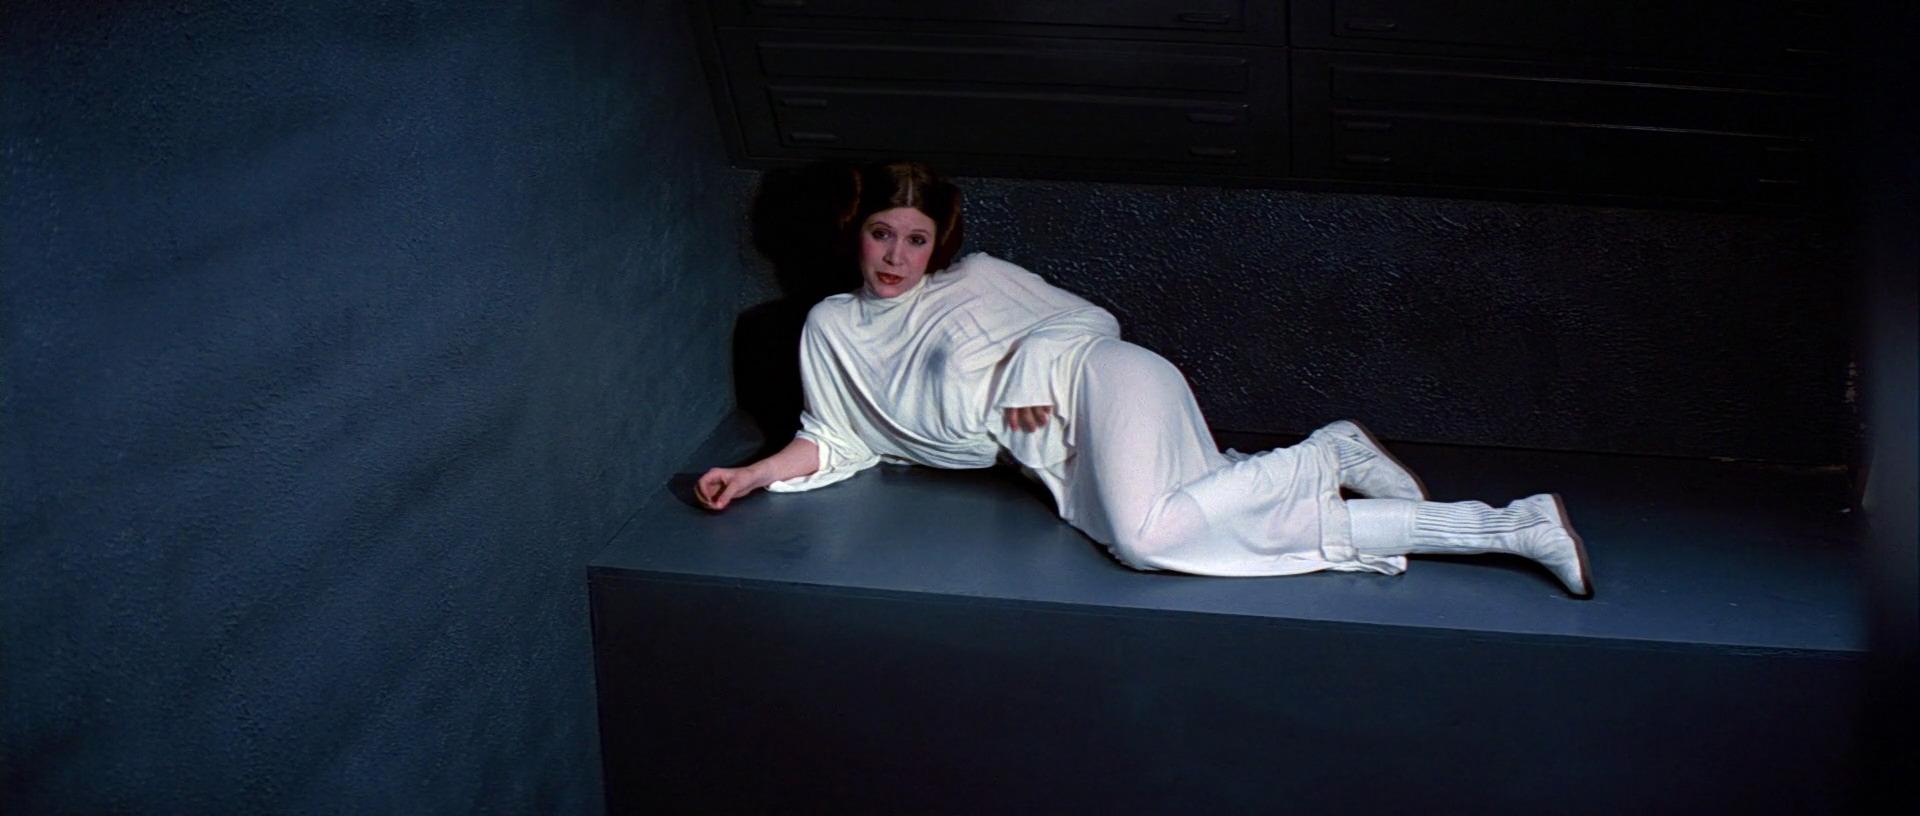 Princess Leia 2